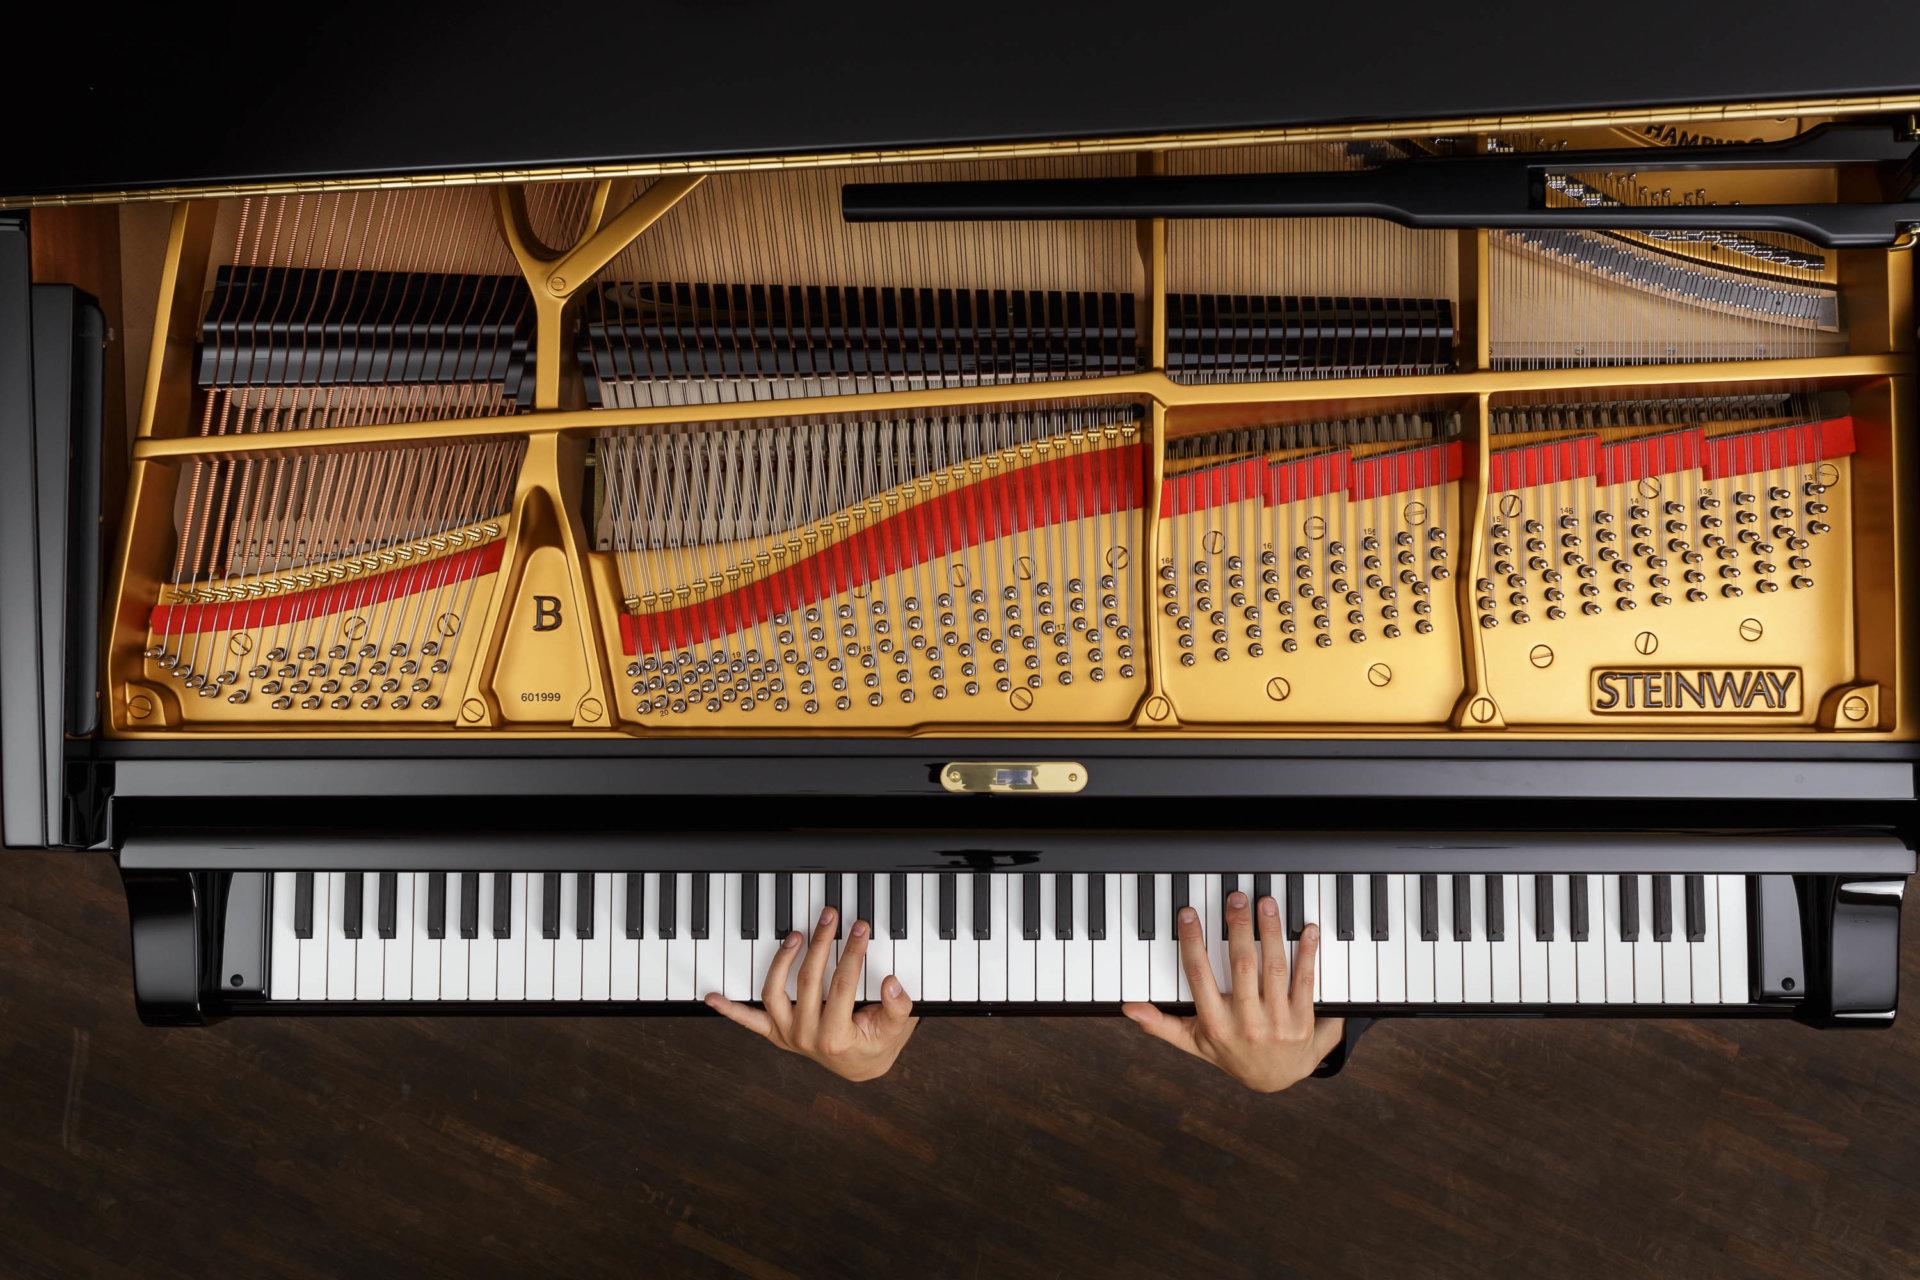 DRUCKEN!, Kultur, MASTERBILD, Pianist, Projekt, Serie, klavier, konzert, meisterfinger, musik, musiker, piano, tasten